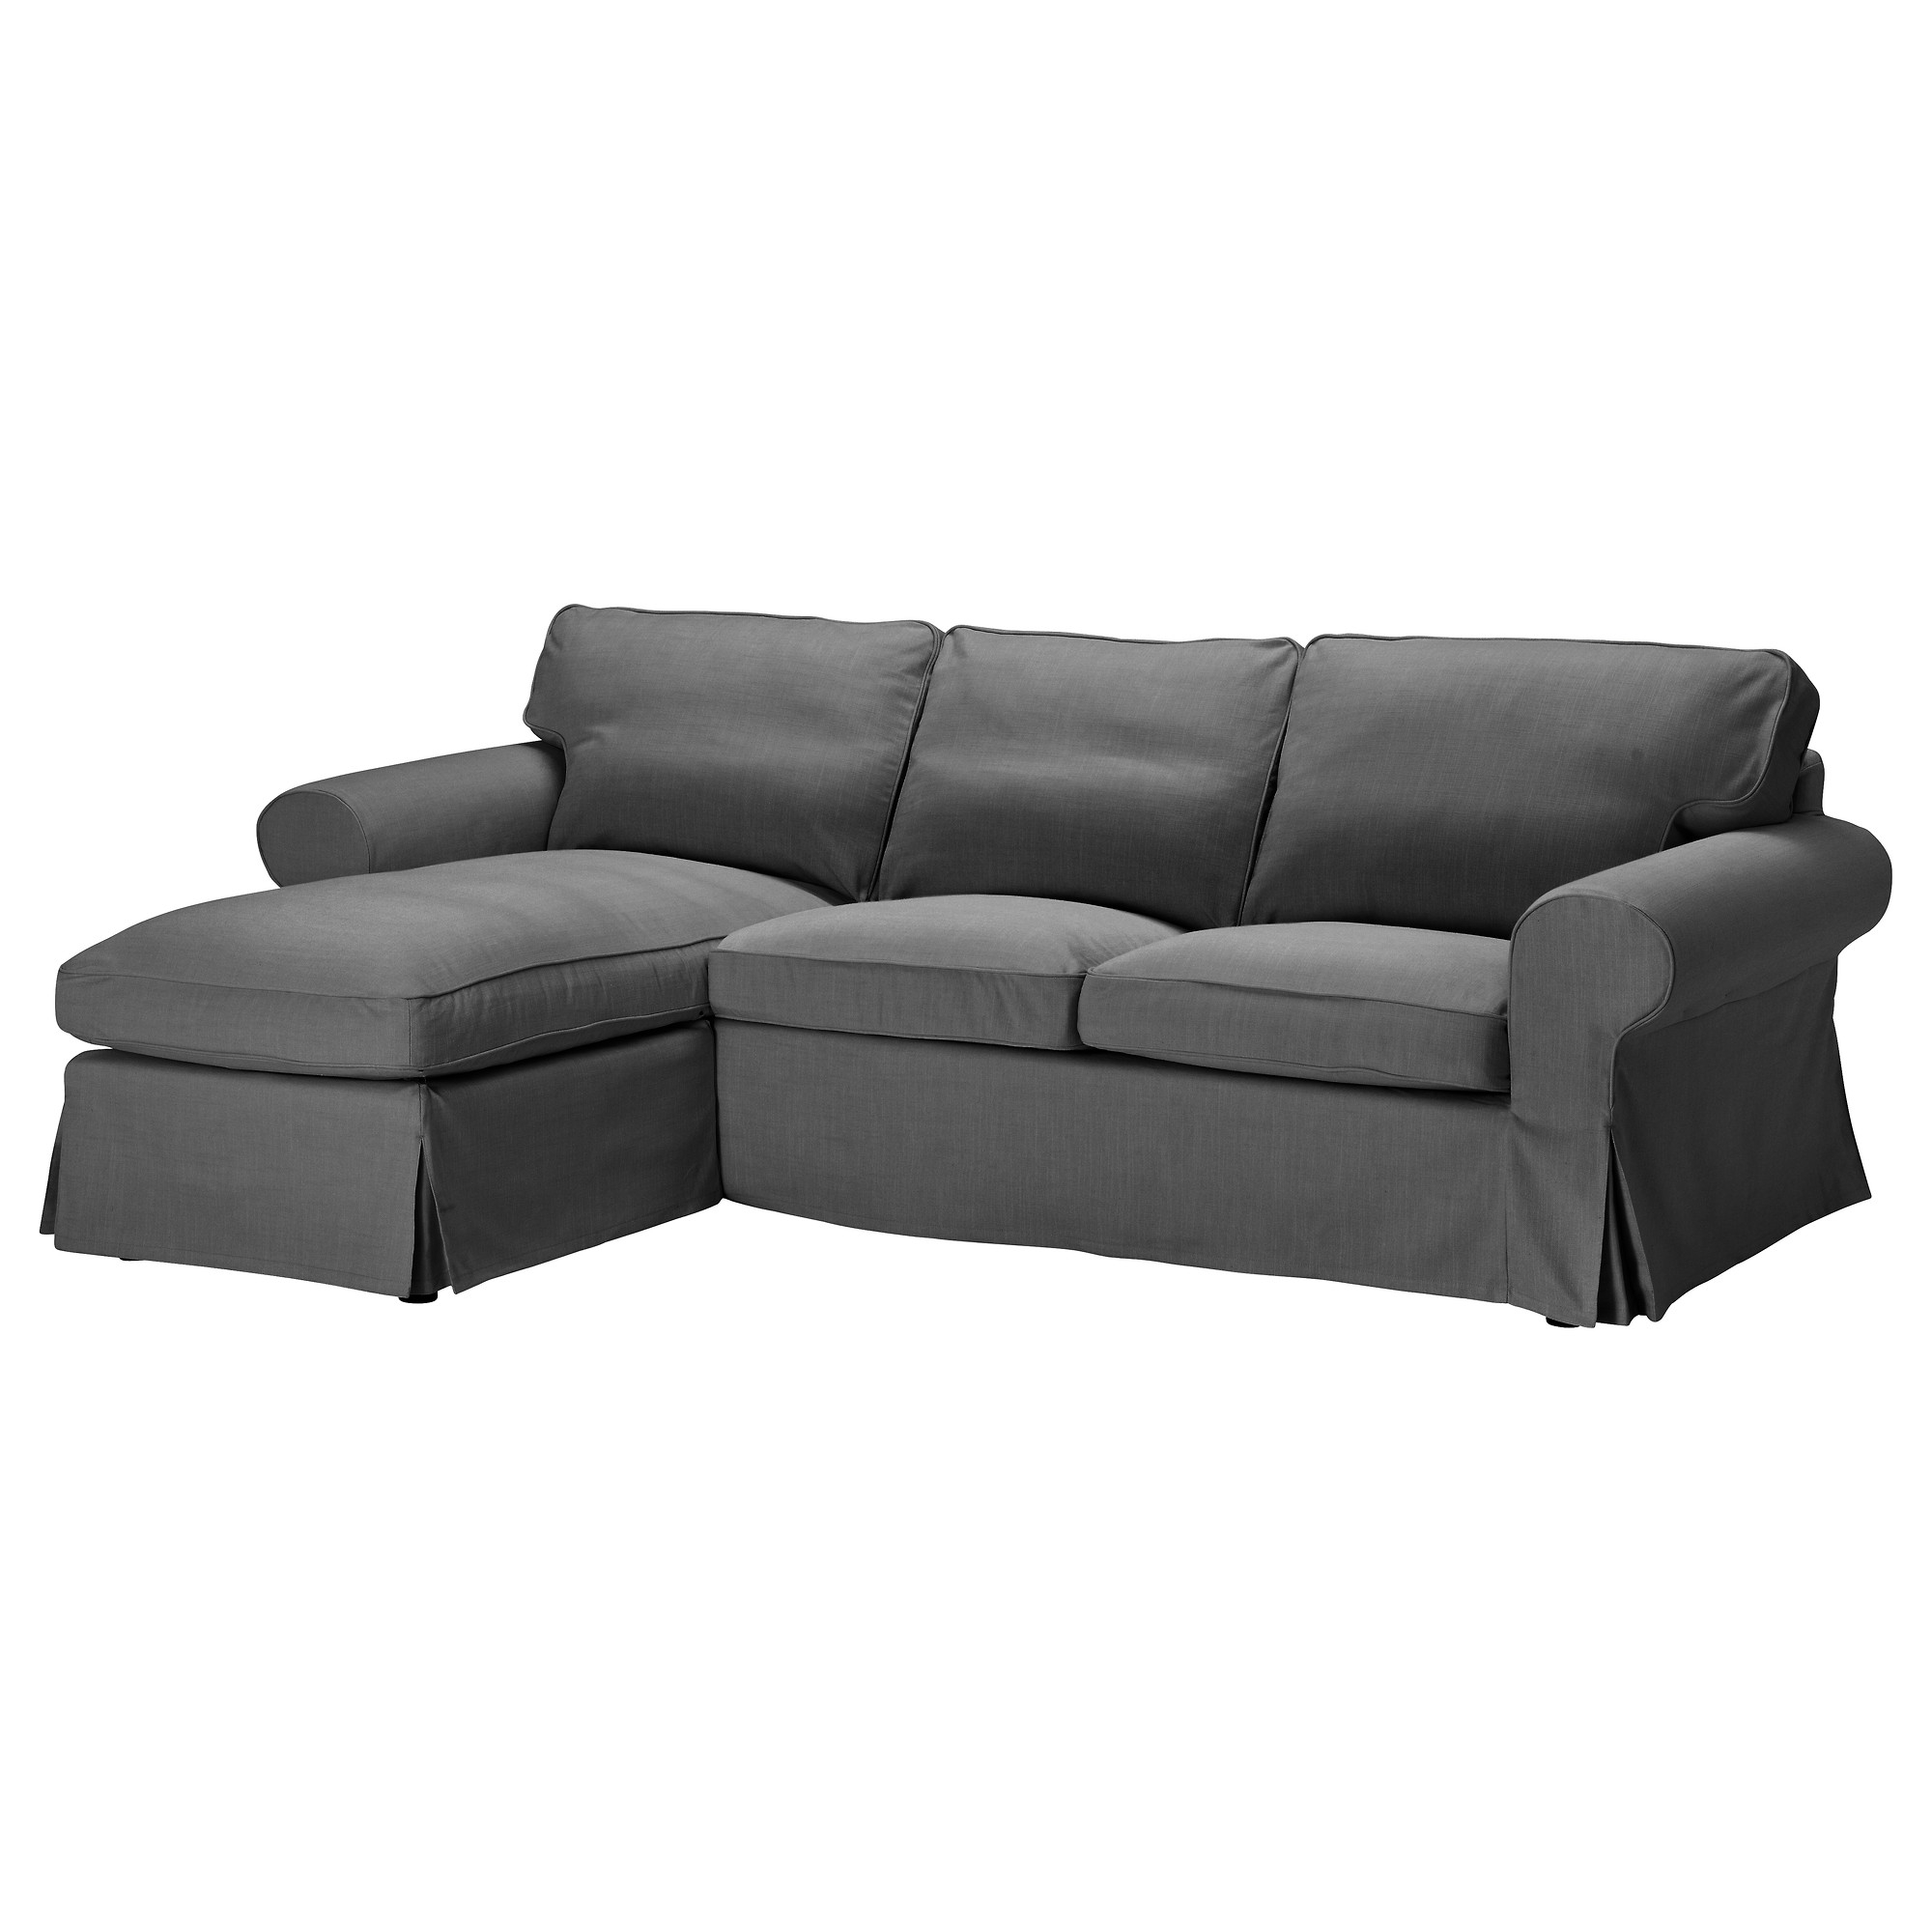 Ikea tenerife dormitorio sal n cocina cama muebles - Sillones tenerife ...